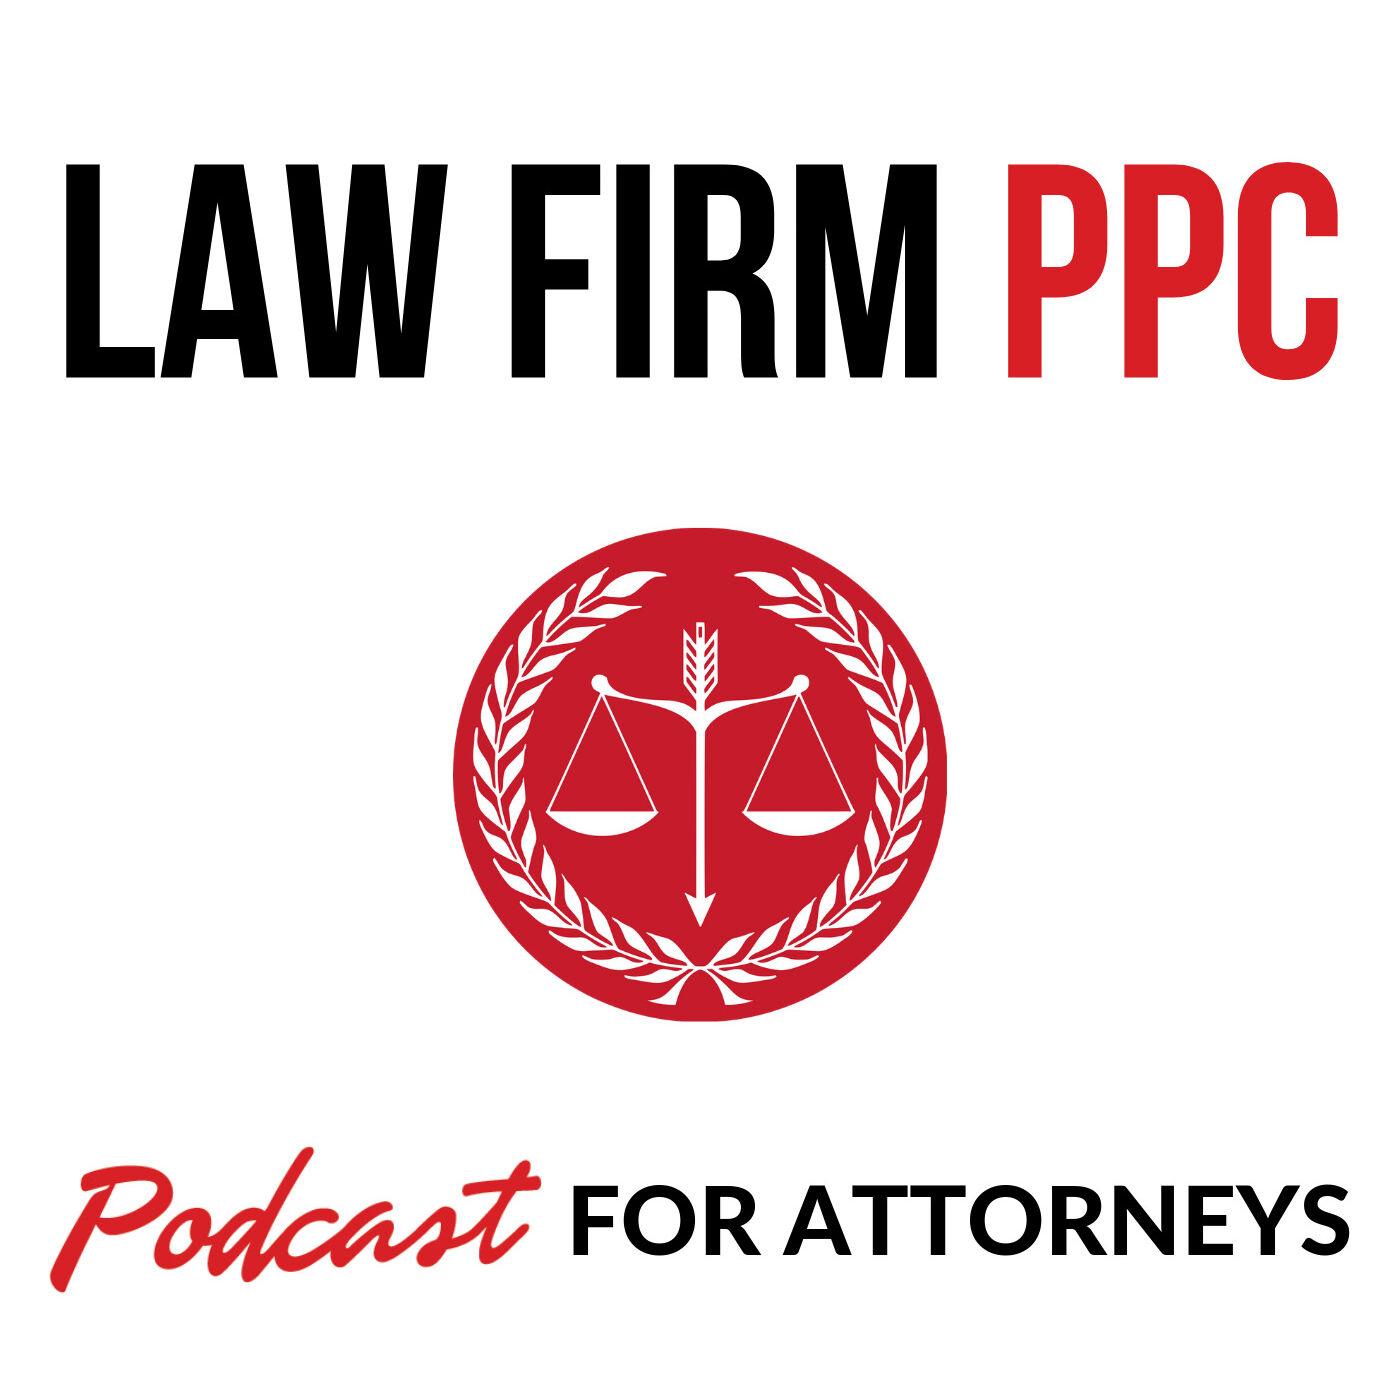 009: Attorney PPC Ad Copy Tips